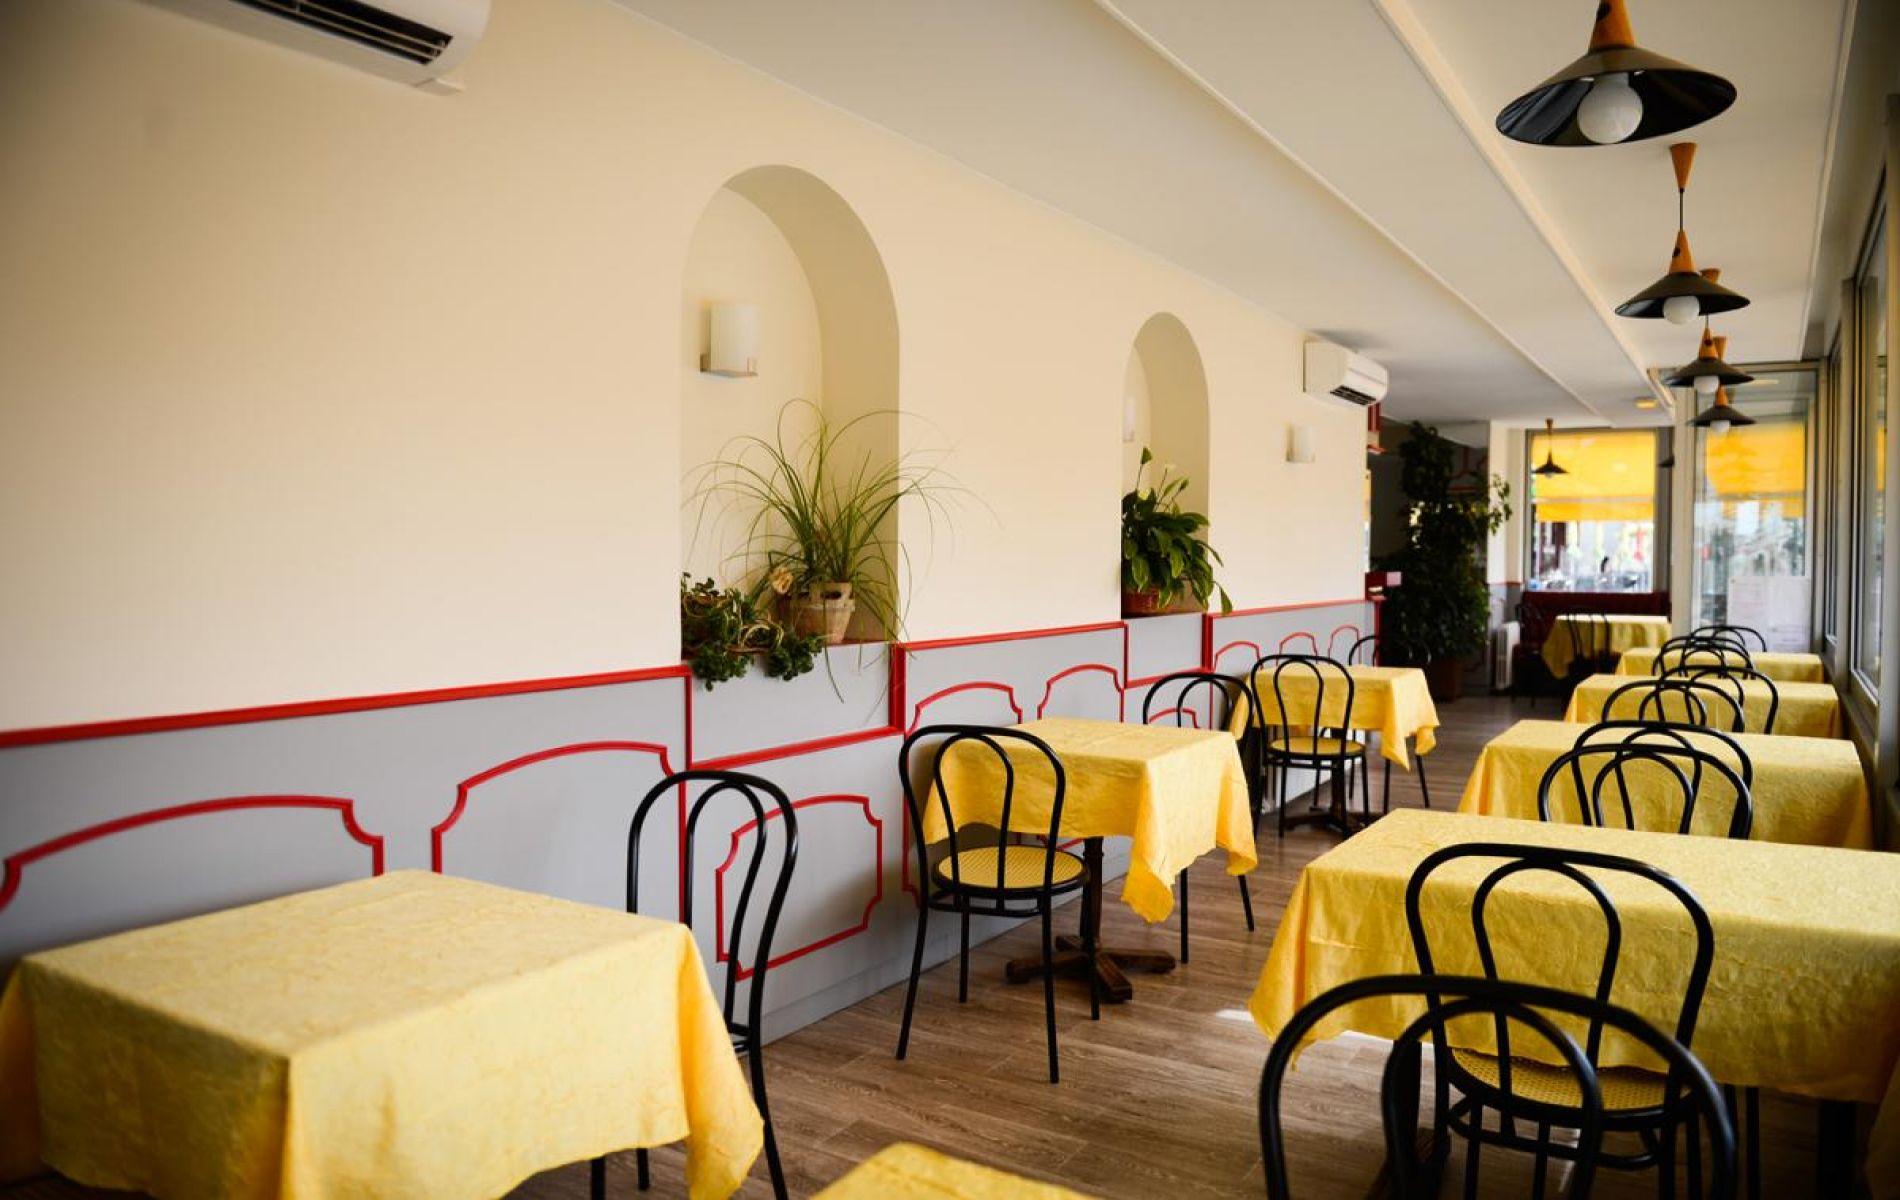 Restaurant Beaumont sur Sarthe